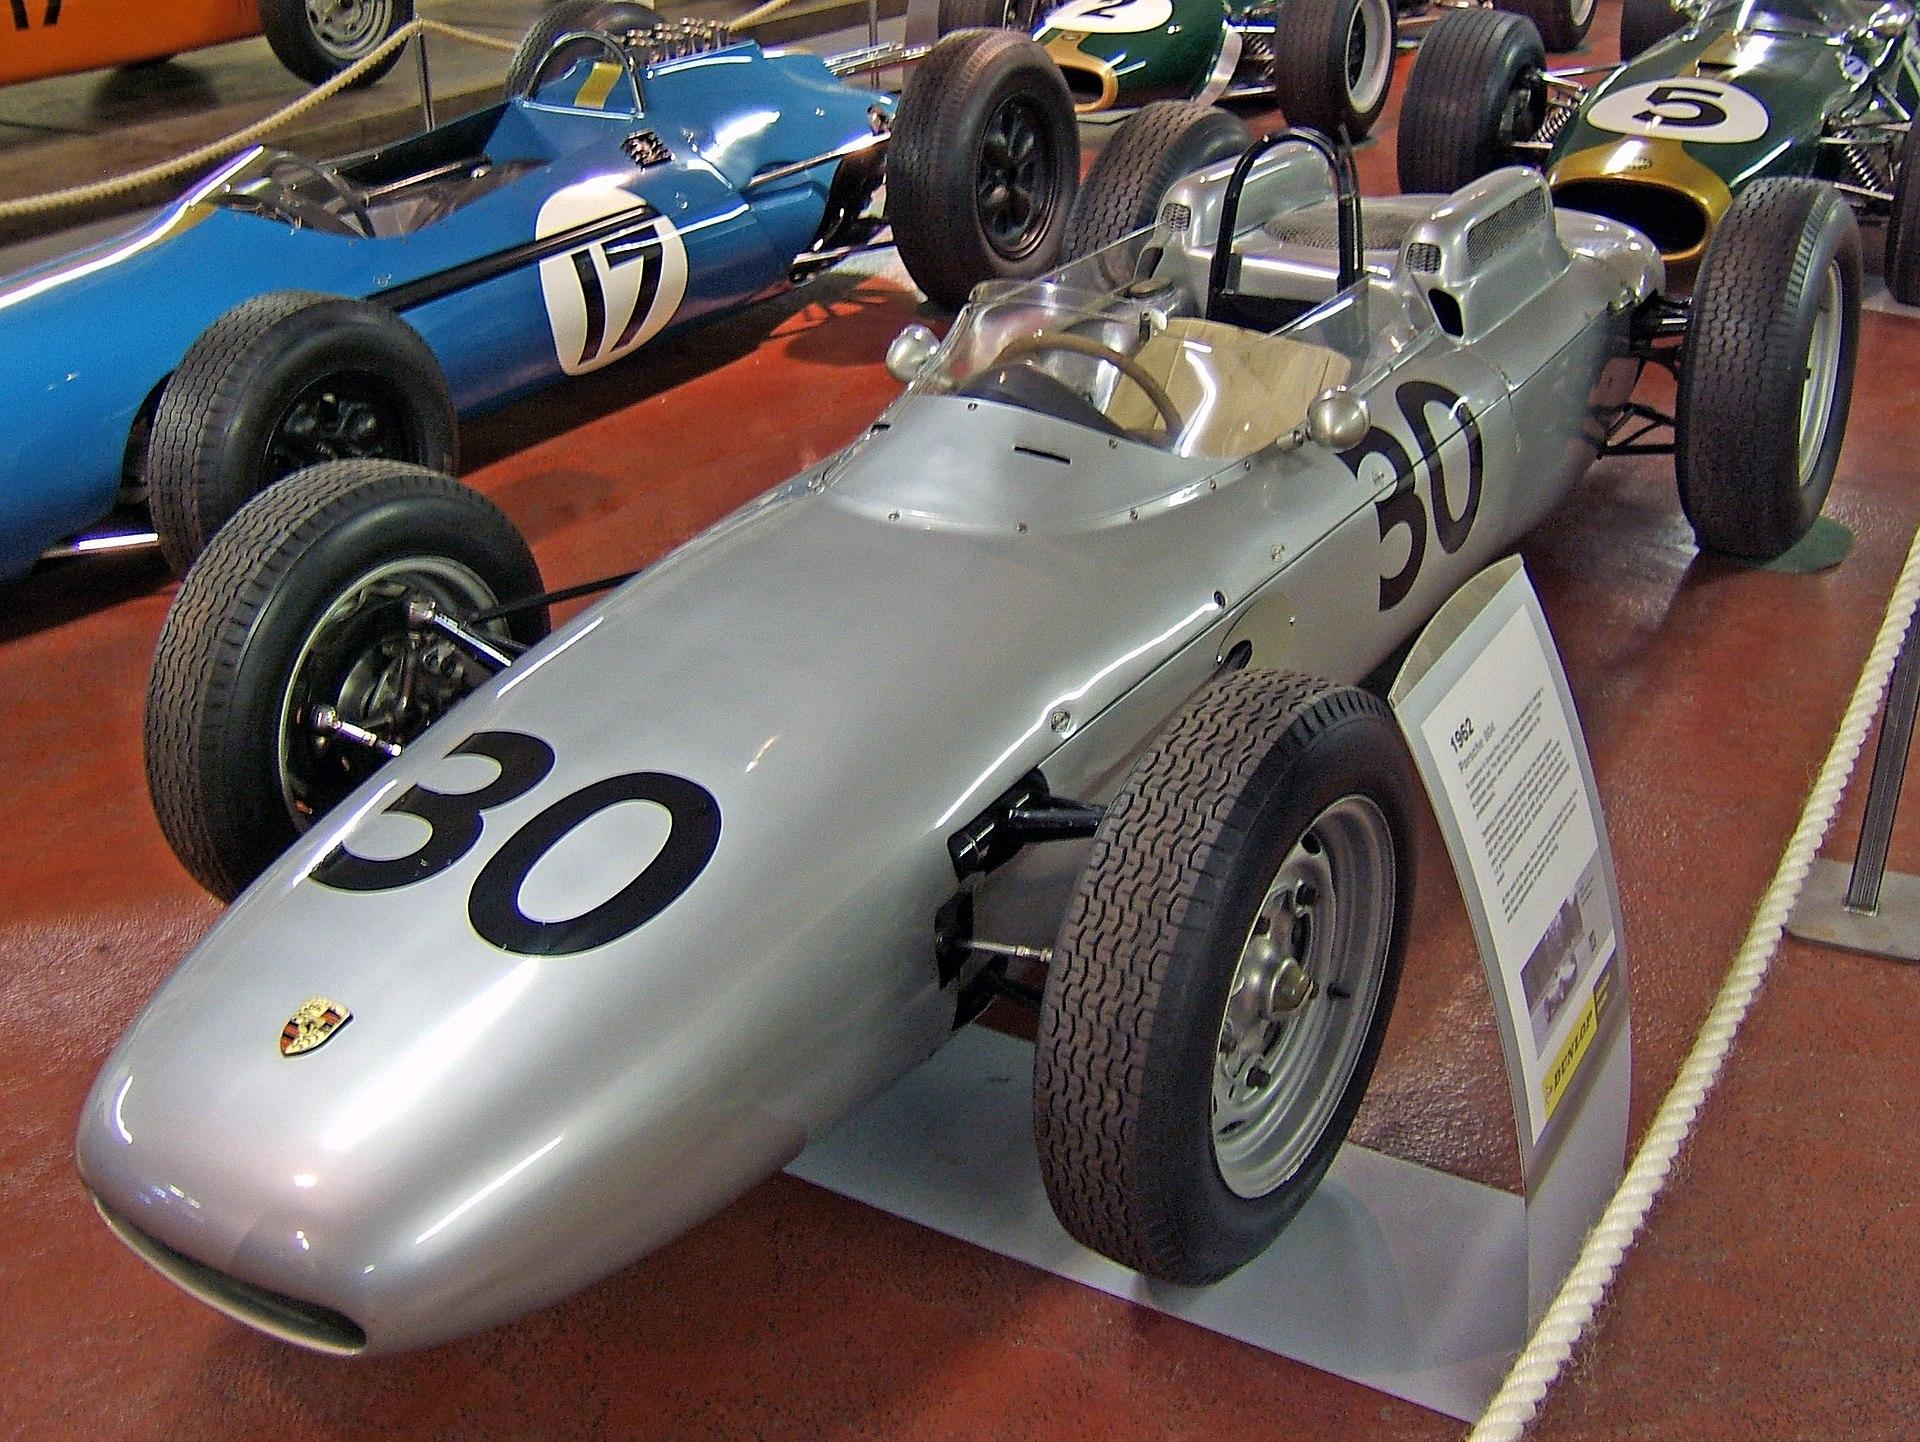 Race Car Non Copy Right Image